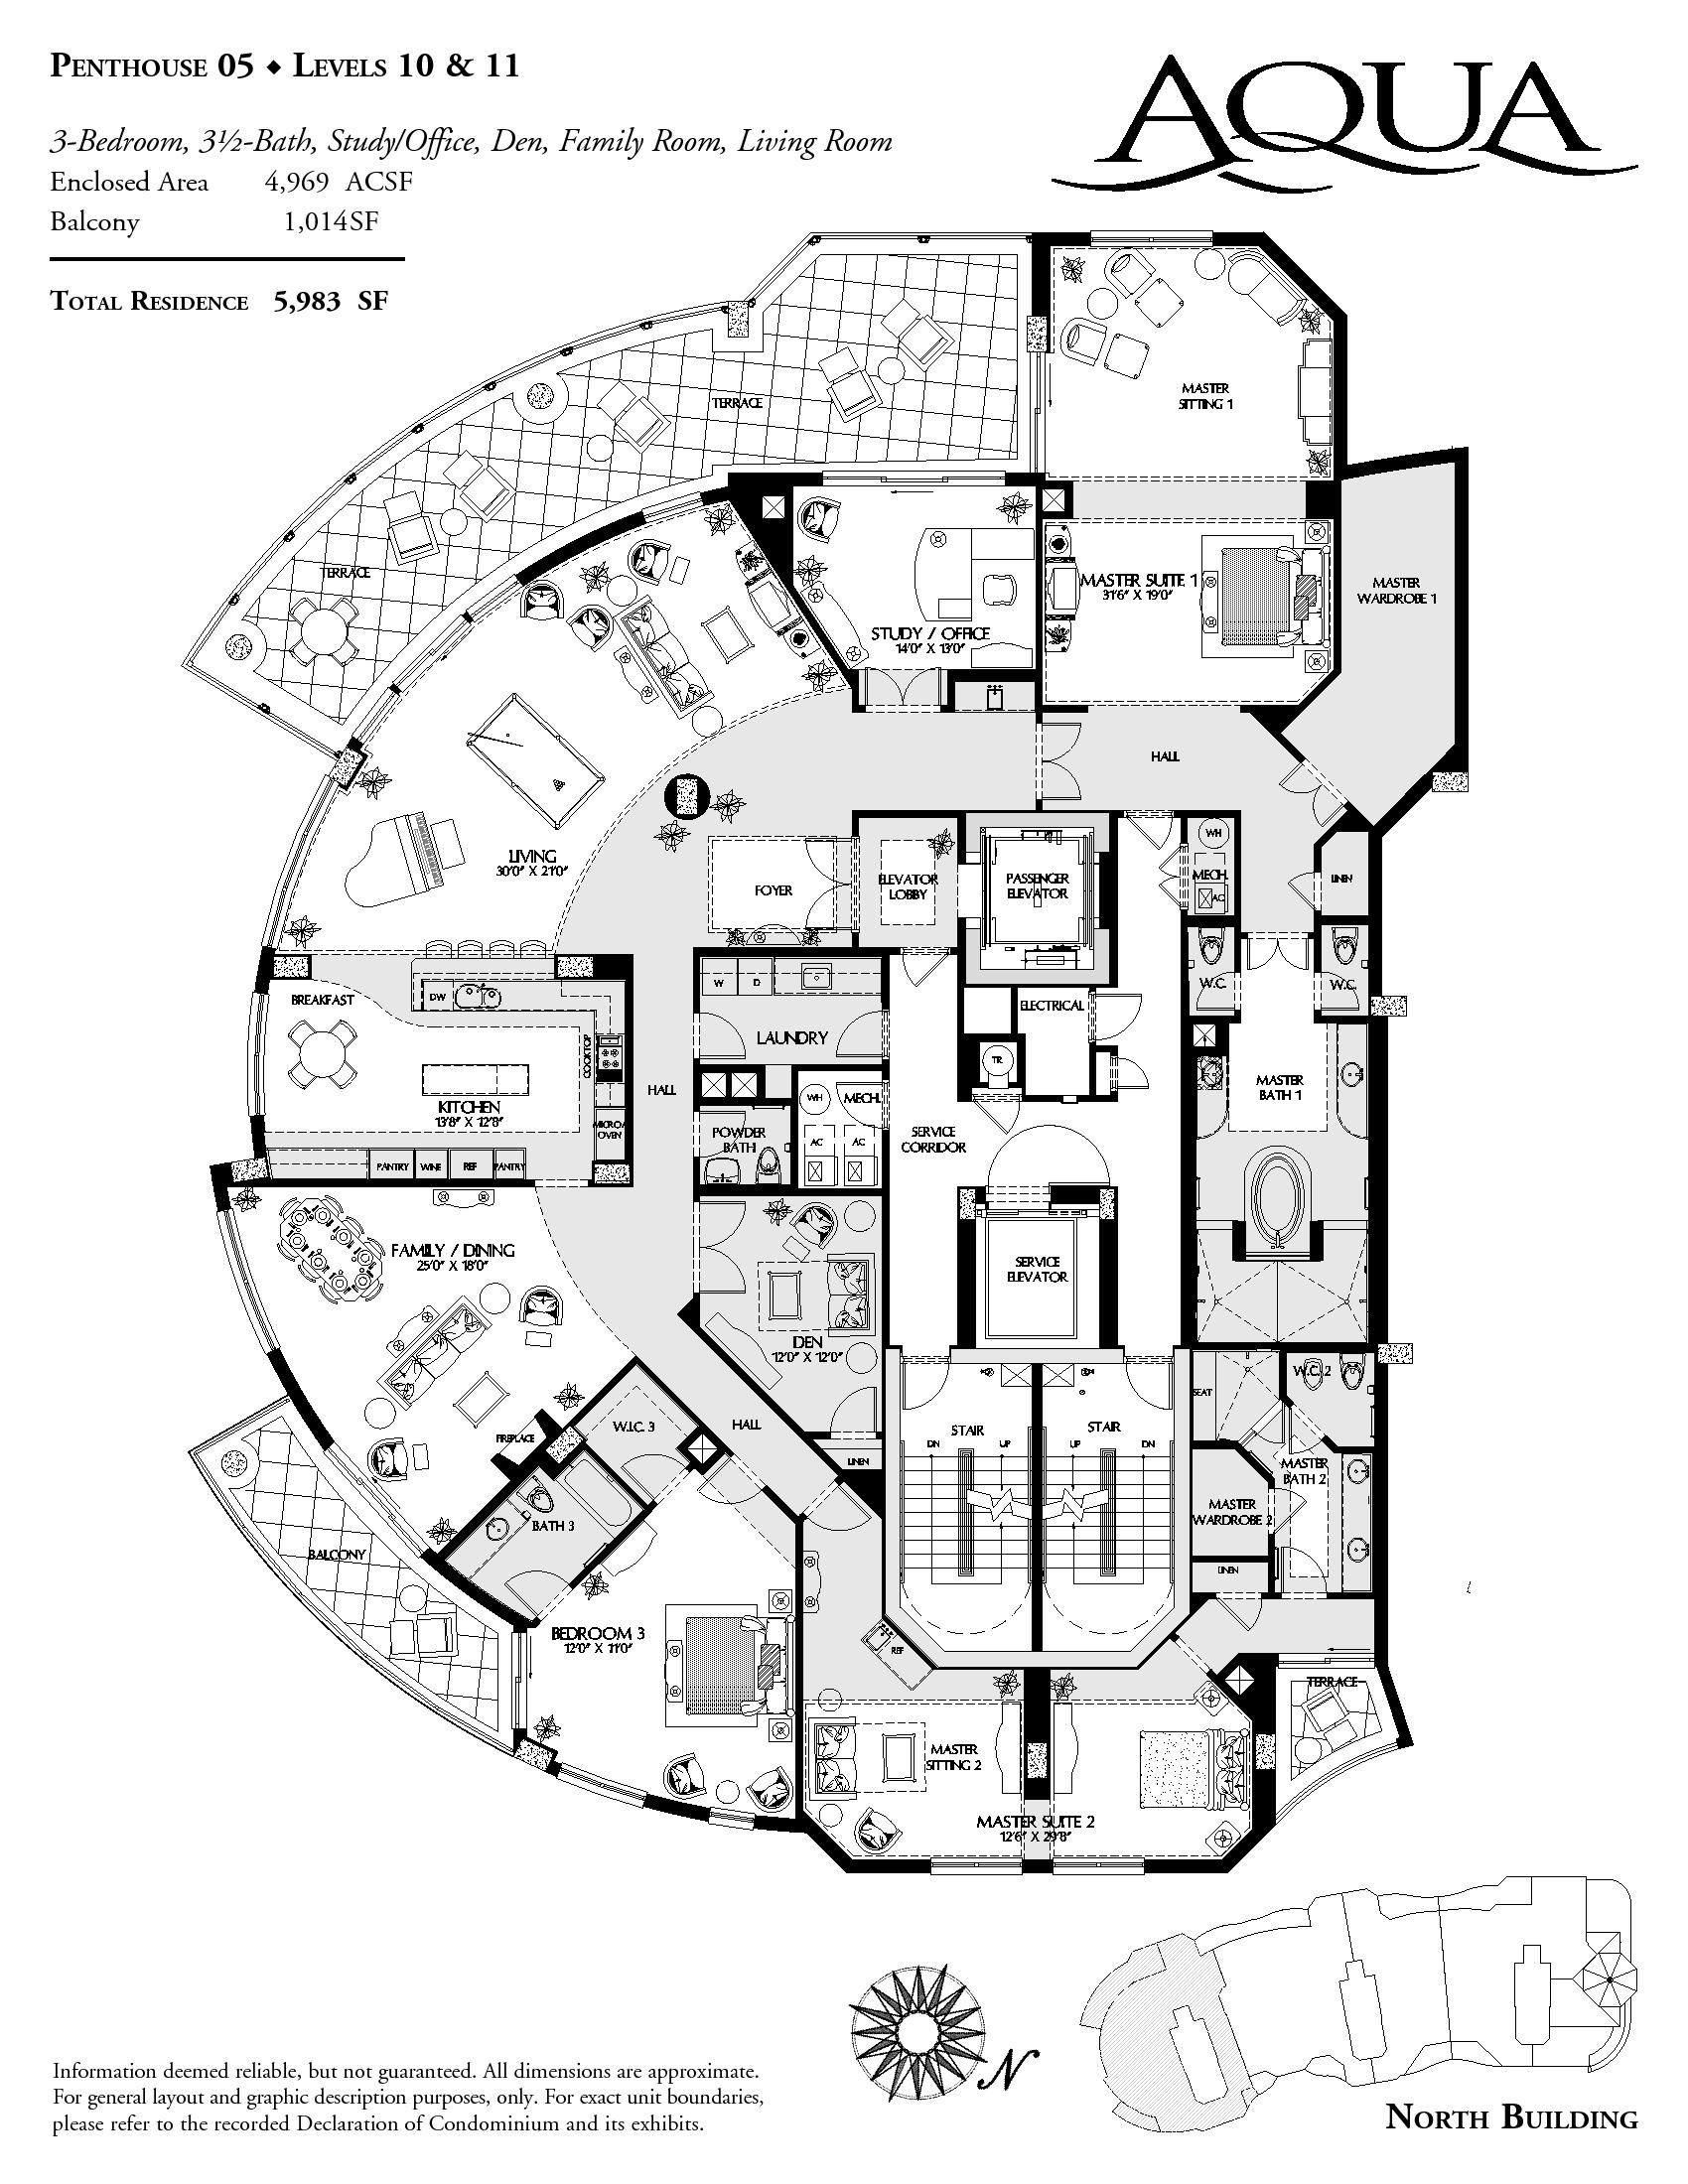 d4925c25cd8c0c2753e562401364eb10 Luxury Pent House With Gym Building Floor Plan on